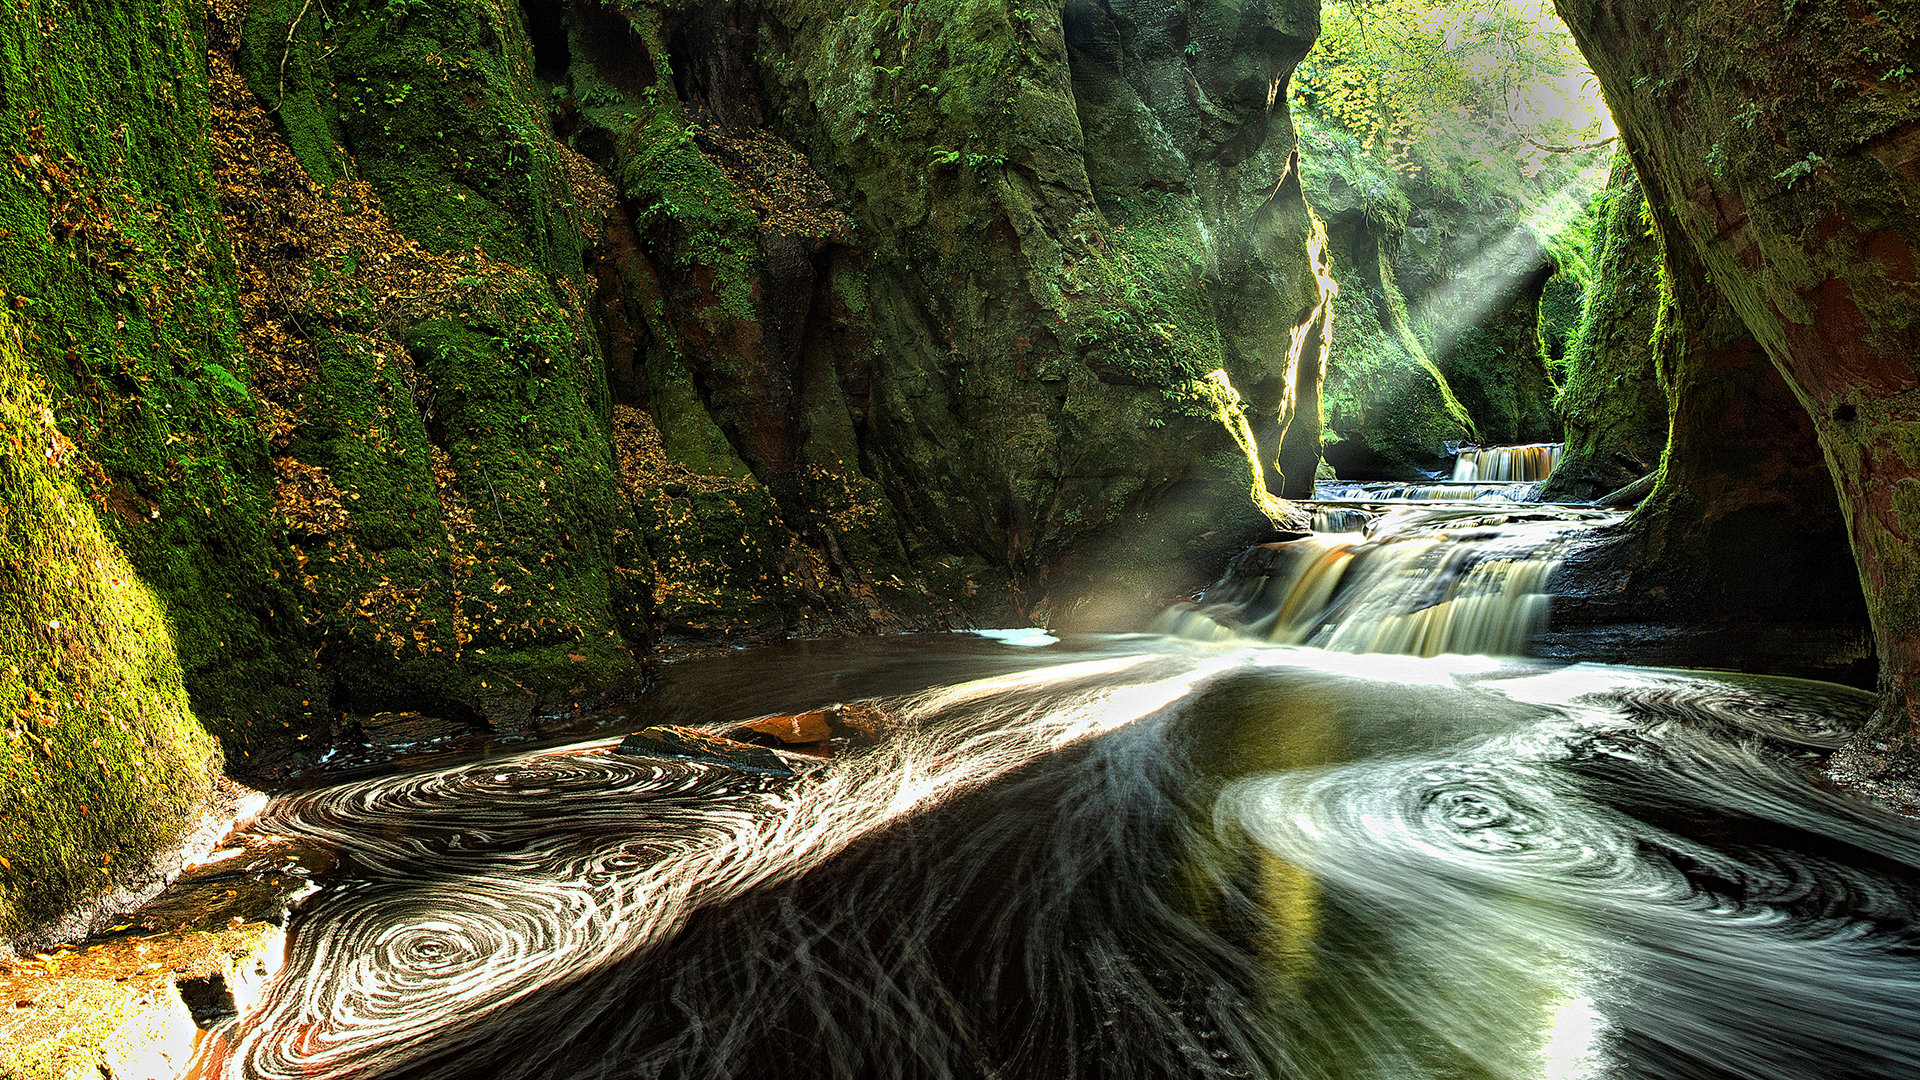 Cave wallpapers 1920x1080 Full HD (1080p) desktop backgrounds